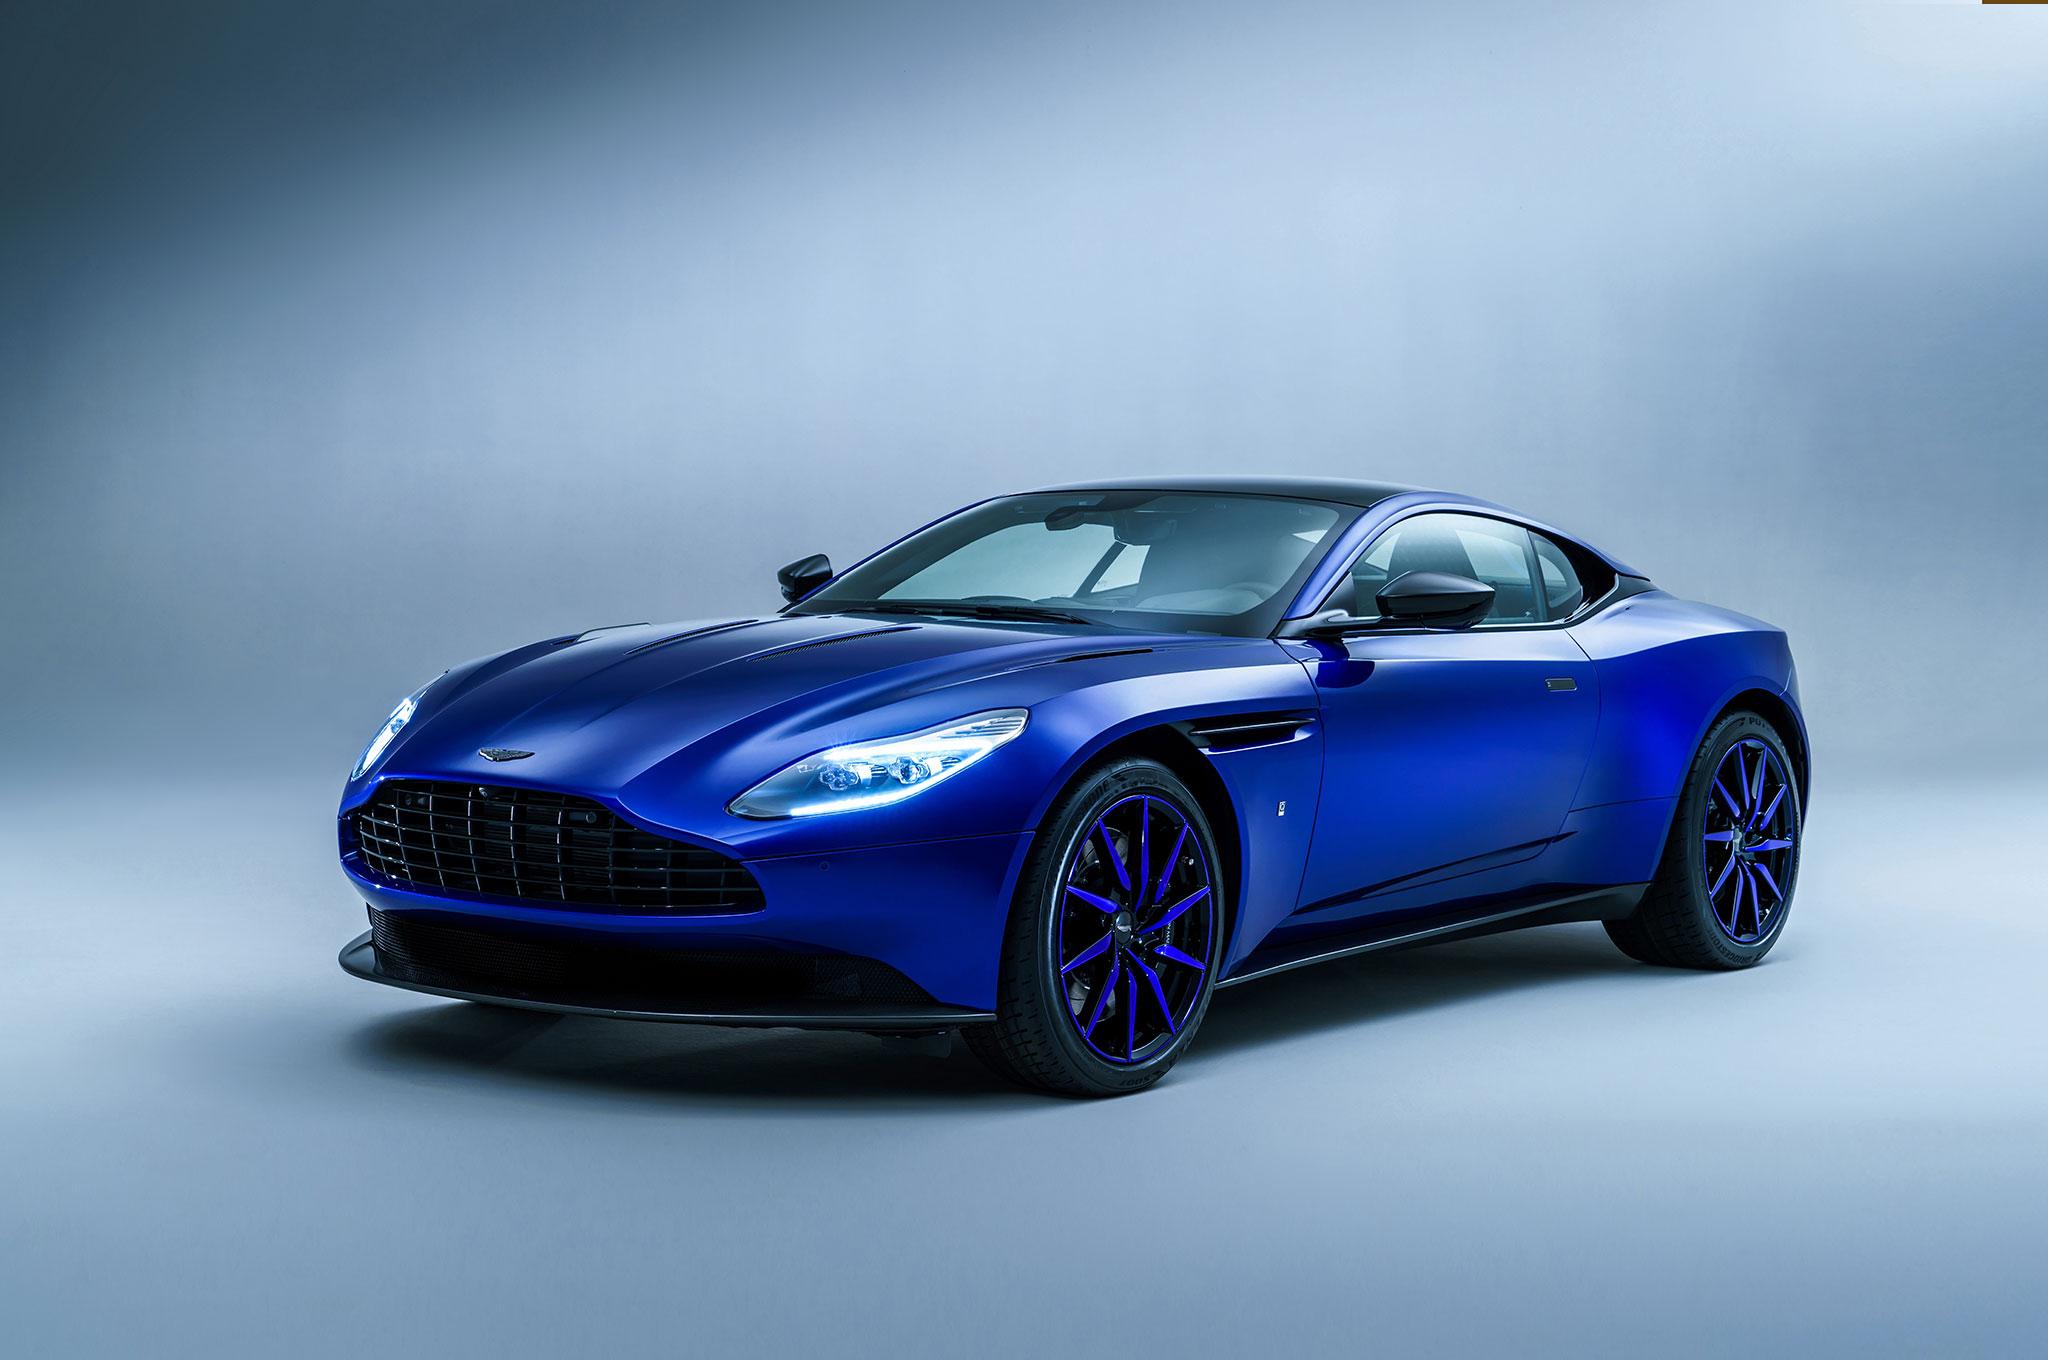 DB11 Q By Aston Martin Front Three Quarter